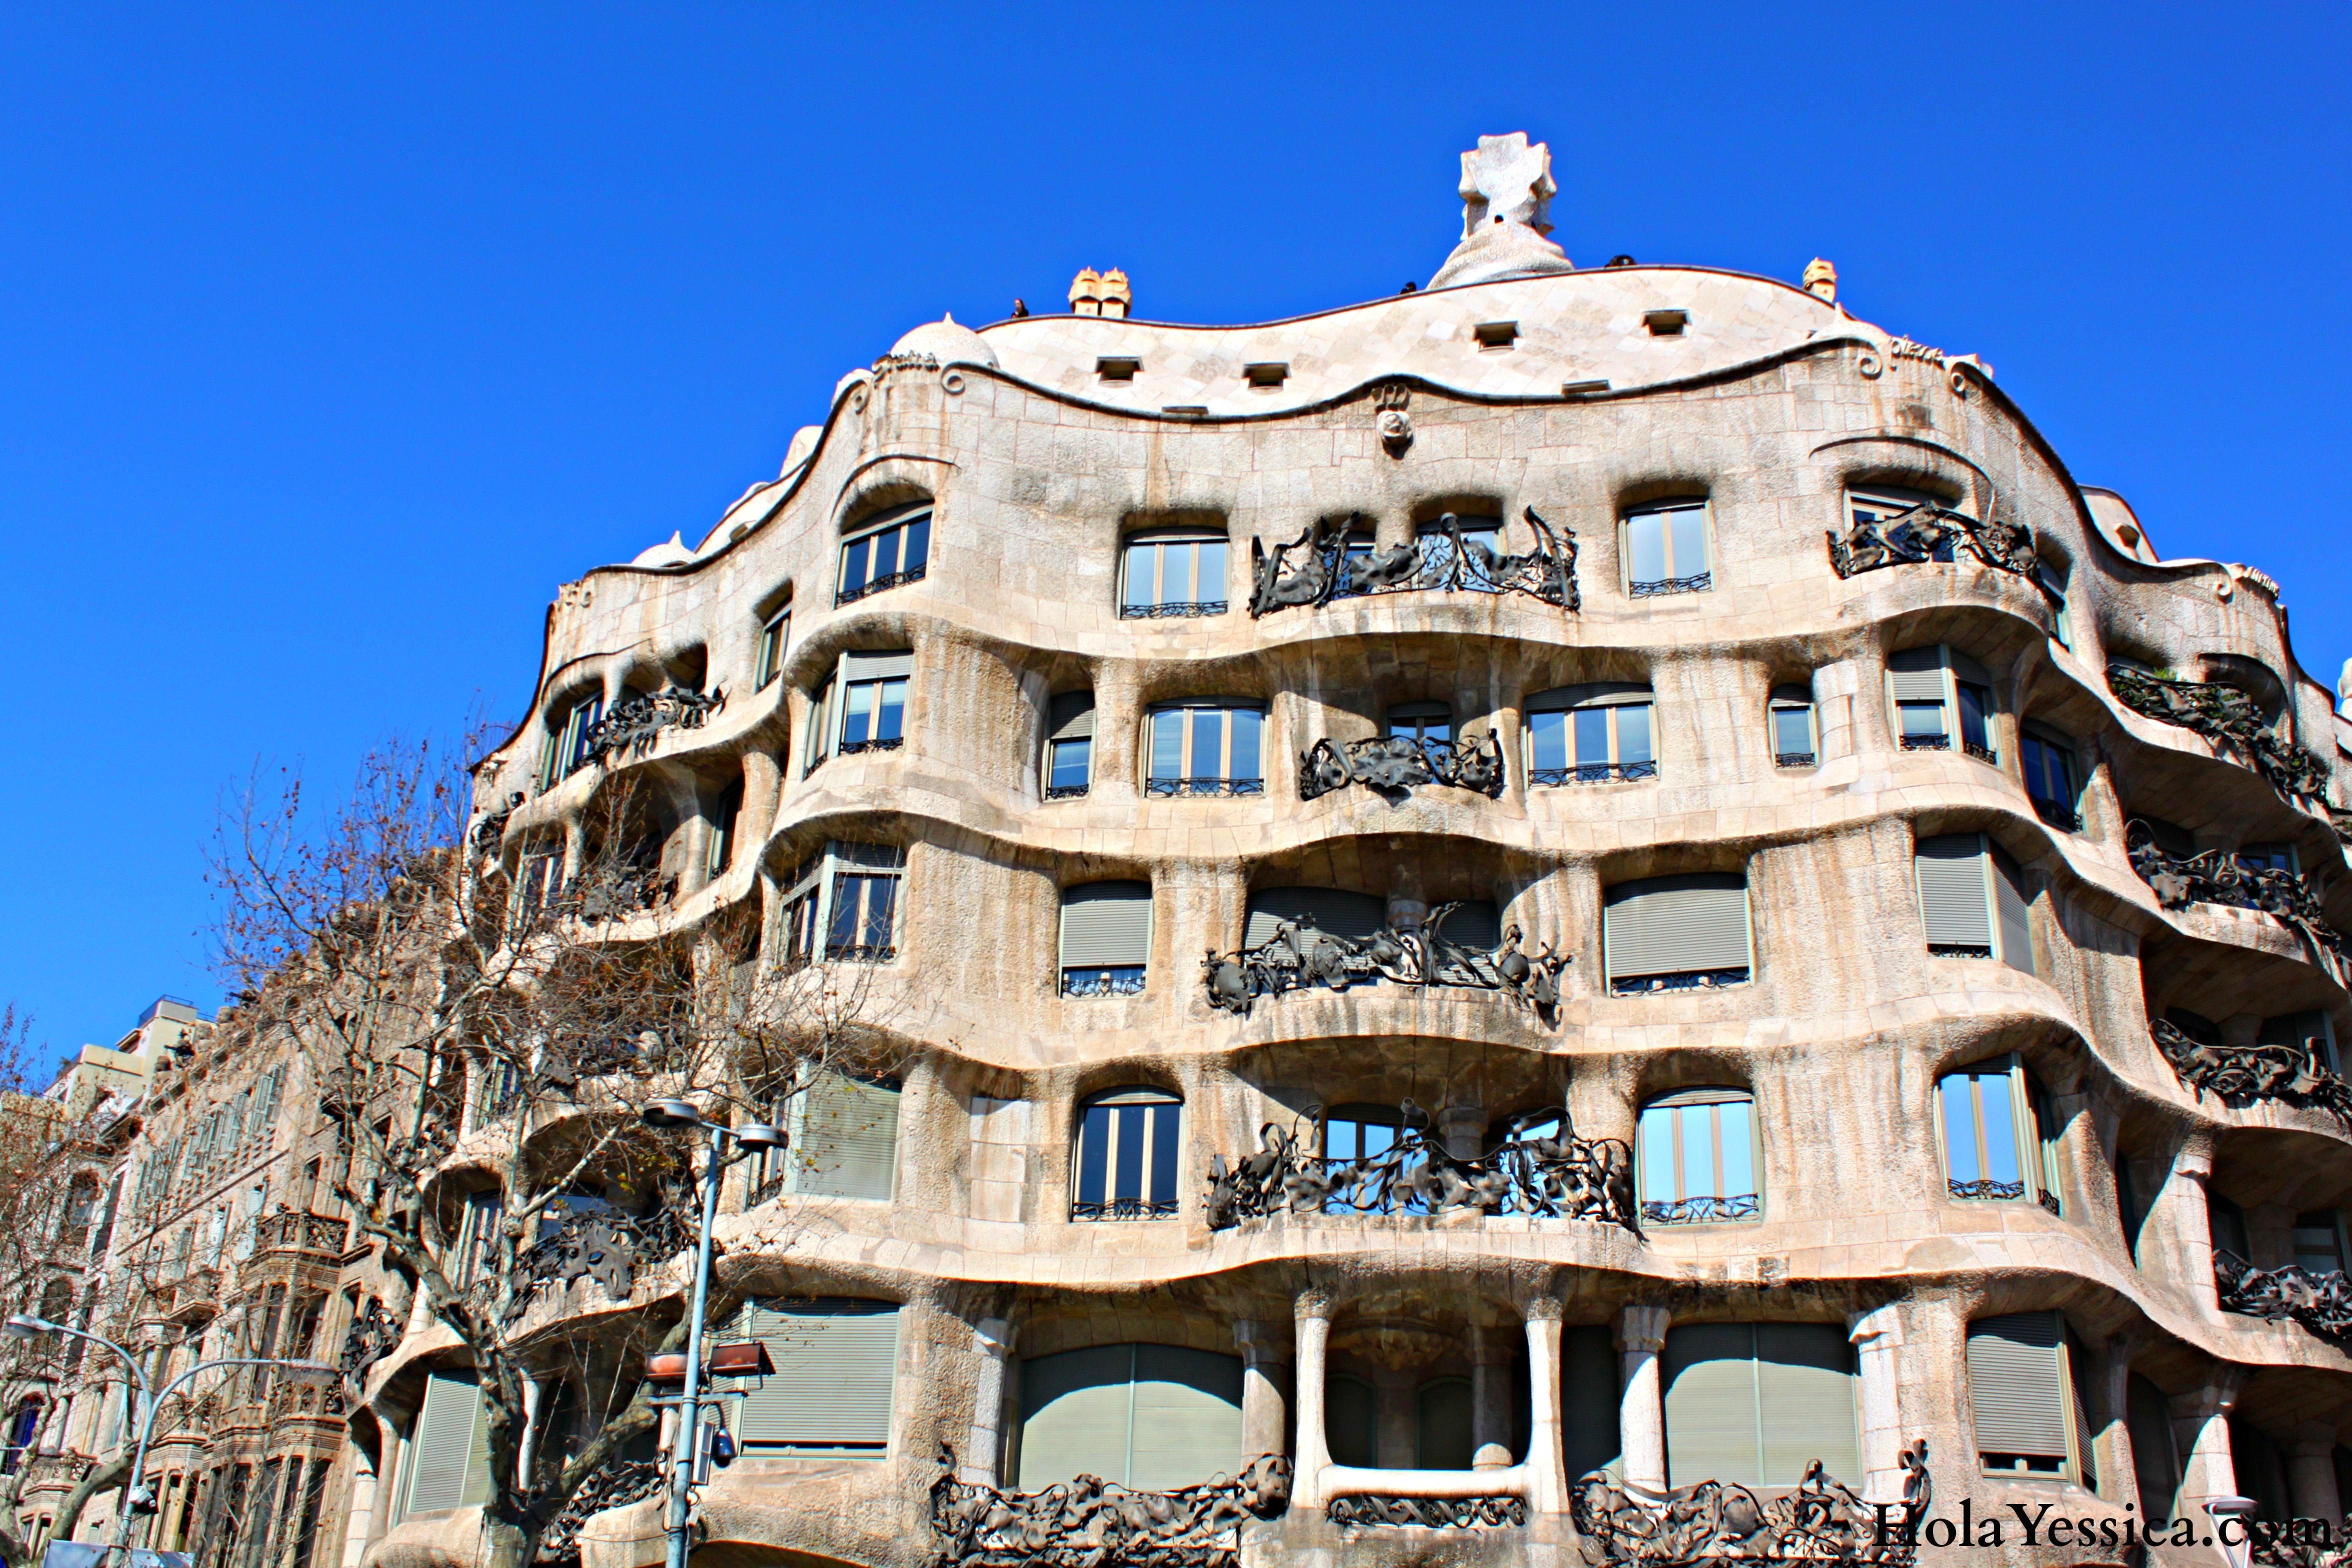 WISW Barcelonas La Pedrera  Hola Yessica